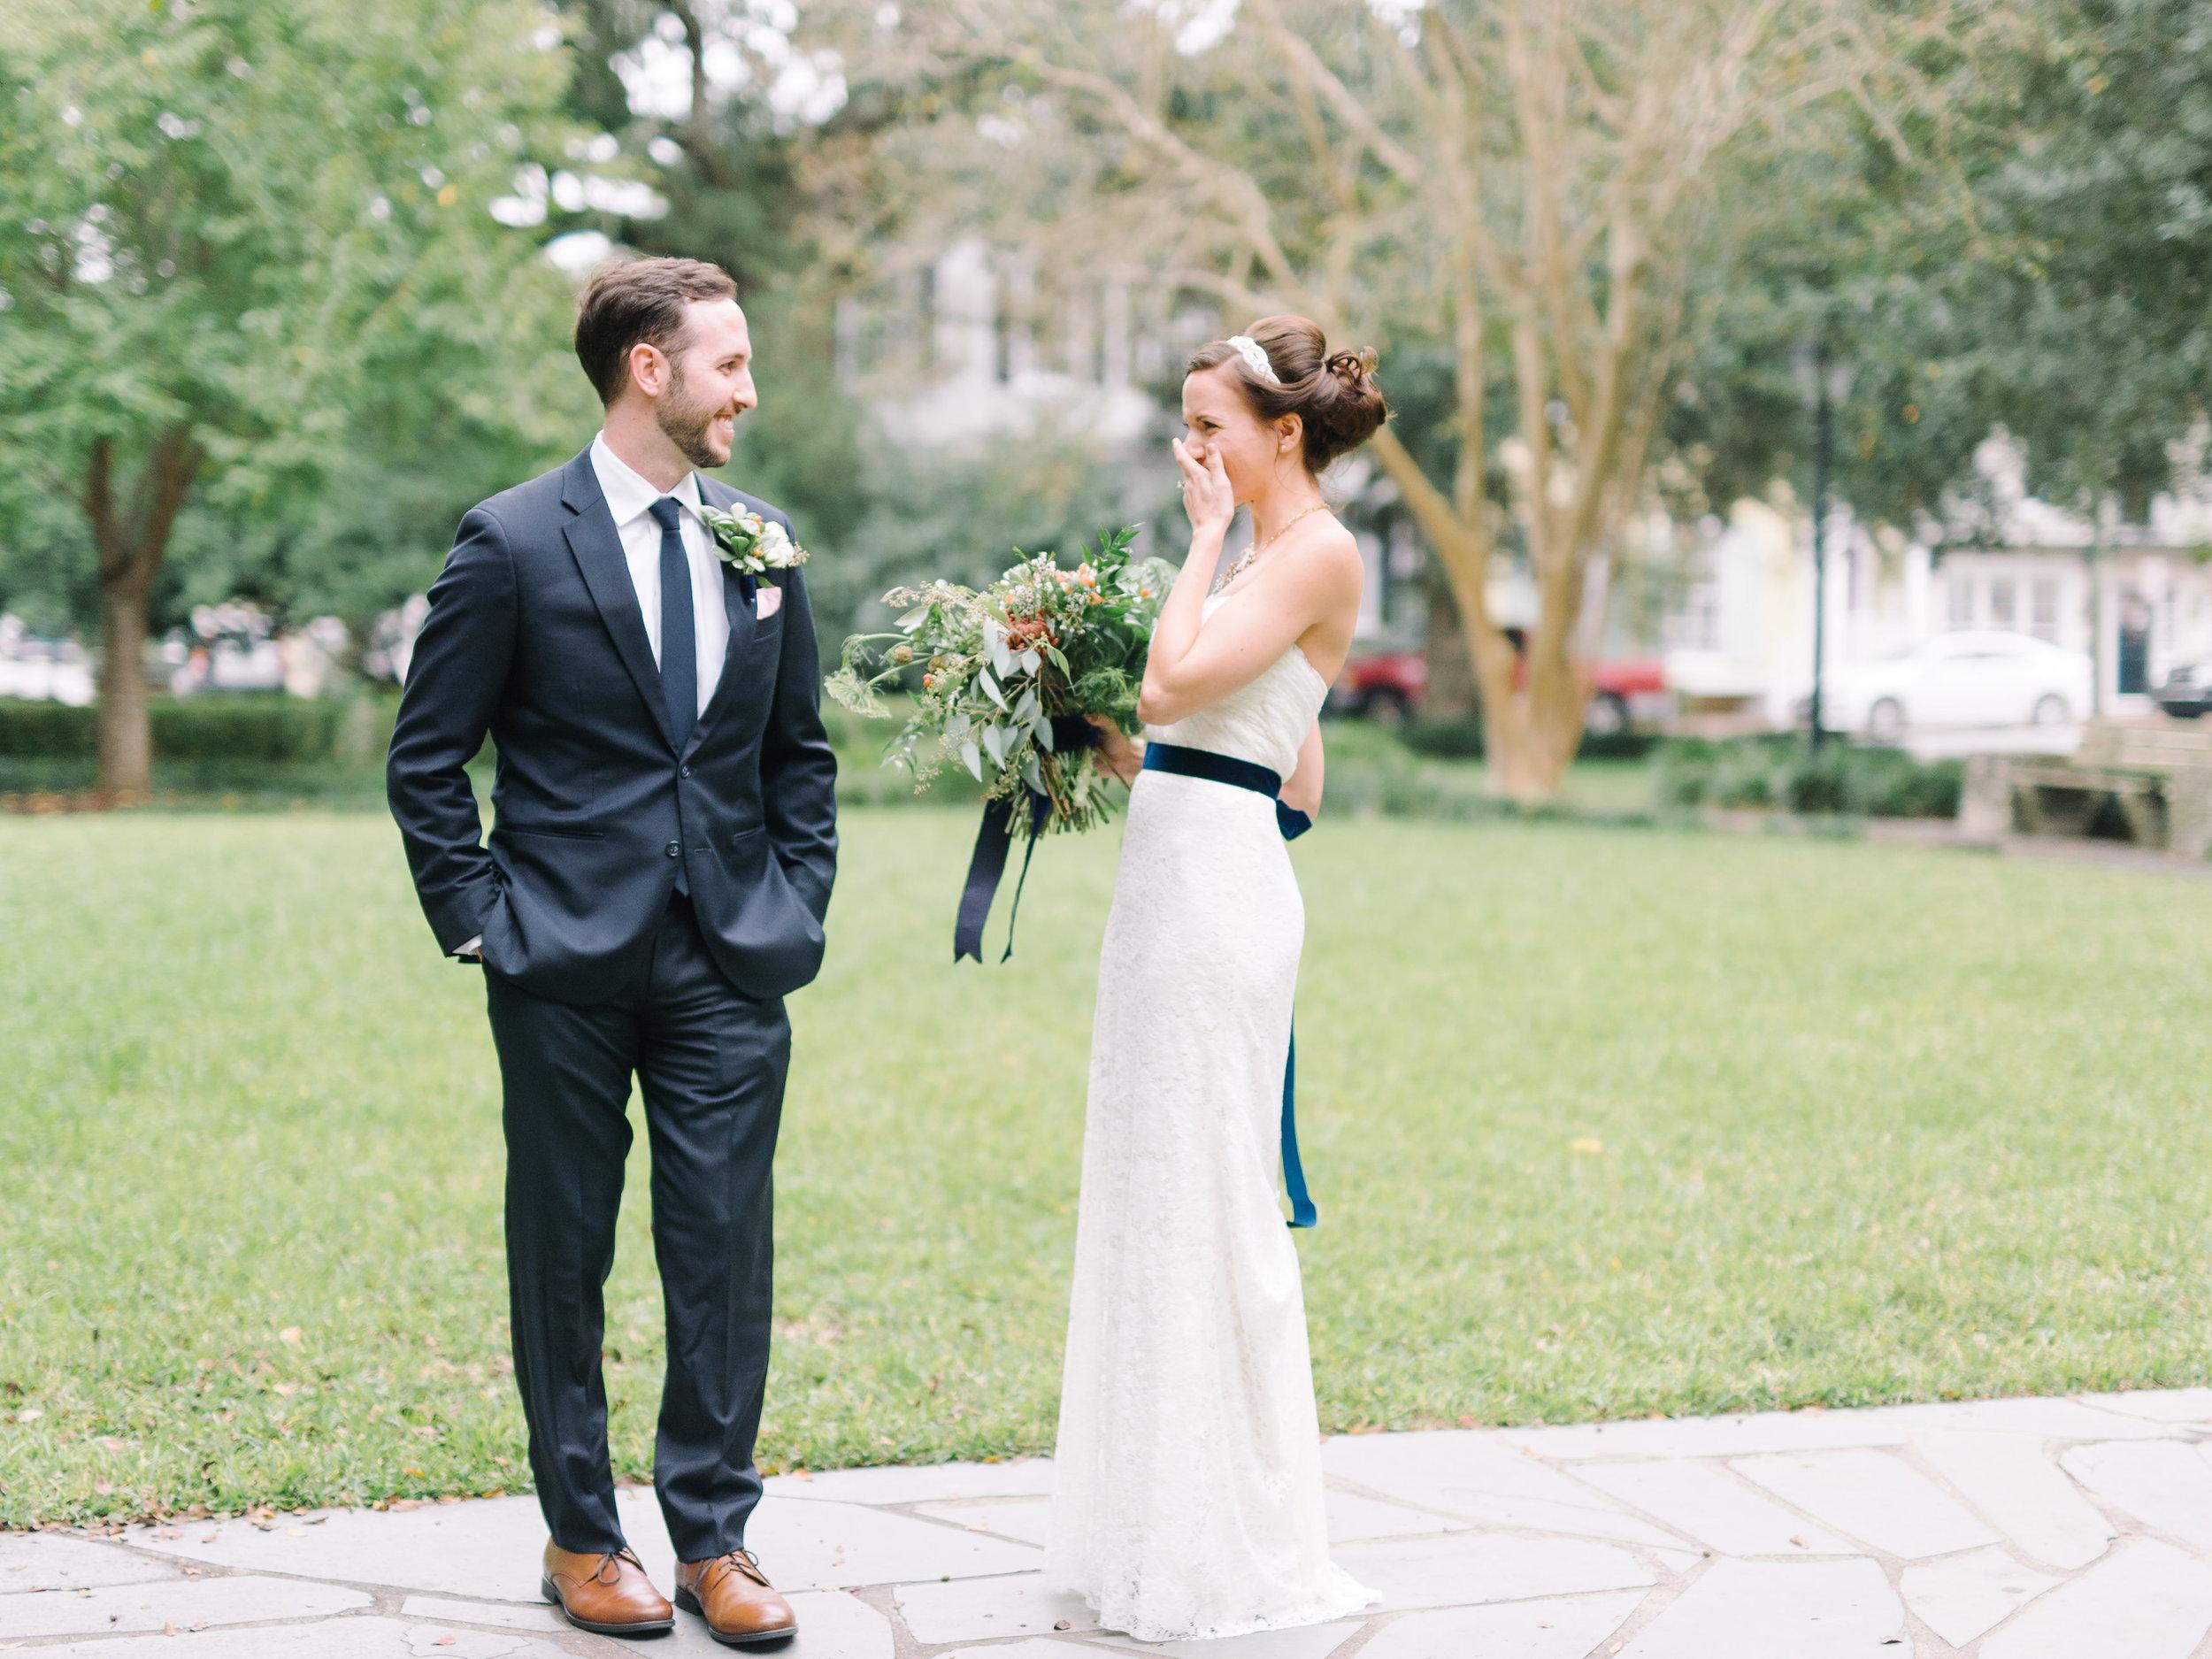 amber-and-paul-rach-loves-troy-charles-h-morris-center-wedding-sarah-seven-helene-lace-wedding-dress-ivory-and-beau-bridal-boutique-savannah-wedding-planner-savannah-event-designer-savannah-florist-savannah-weddings-savannah-bridal-boutique-9.jpg